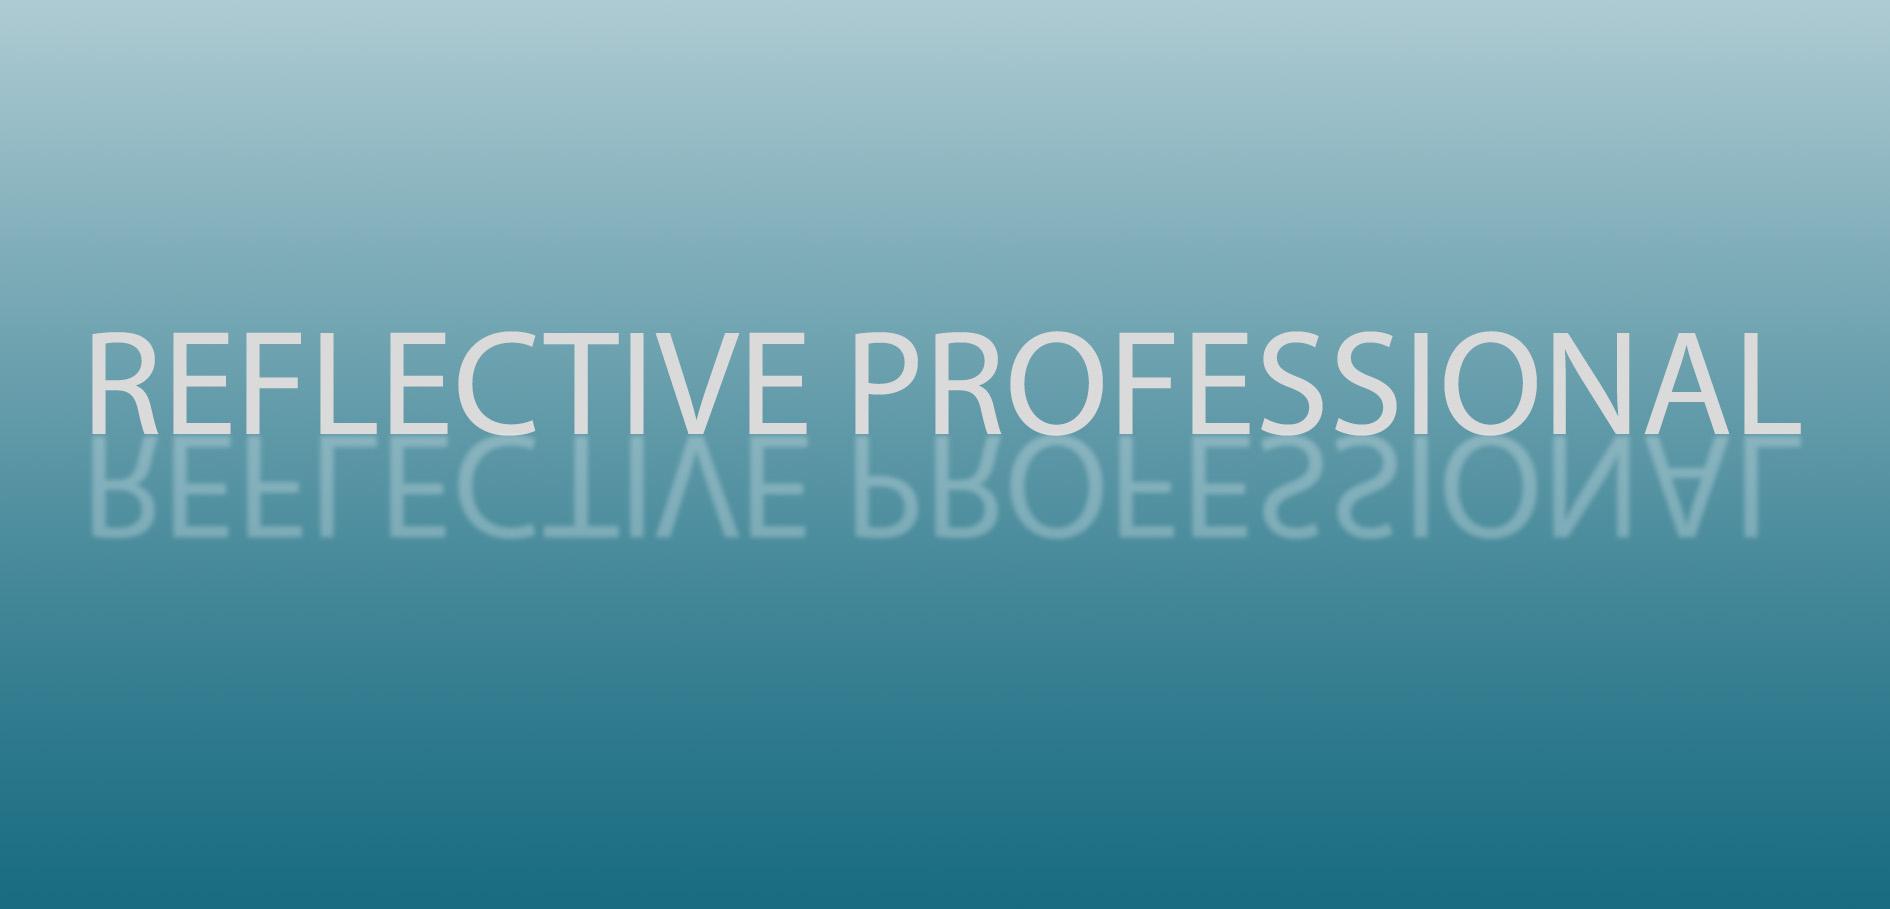 Reflective Professional